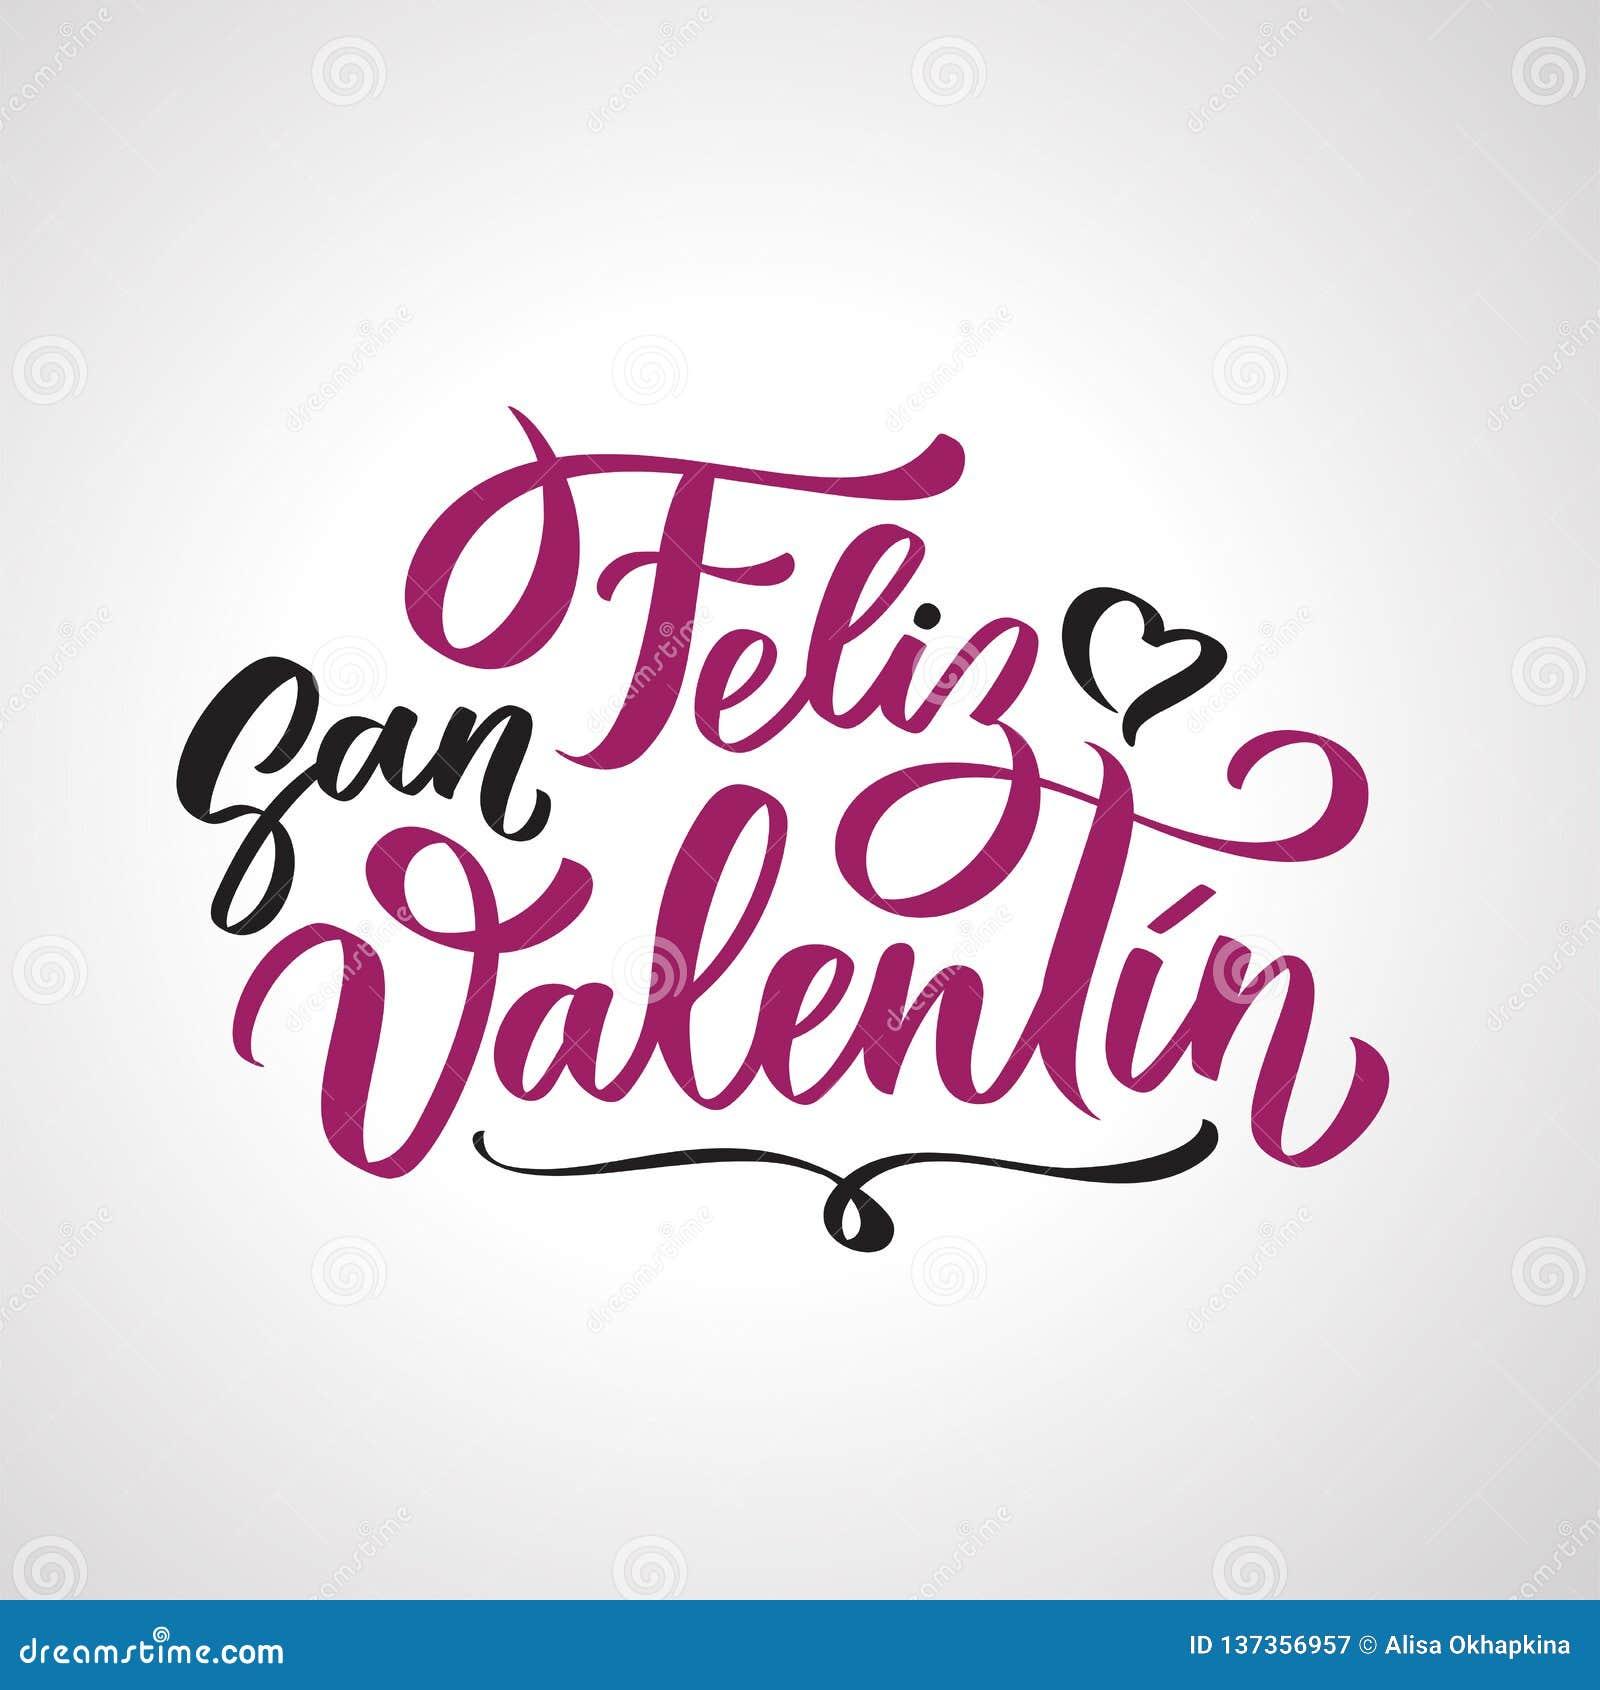 Feliz San Valentin handskriven text på spanskt